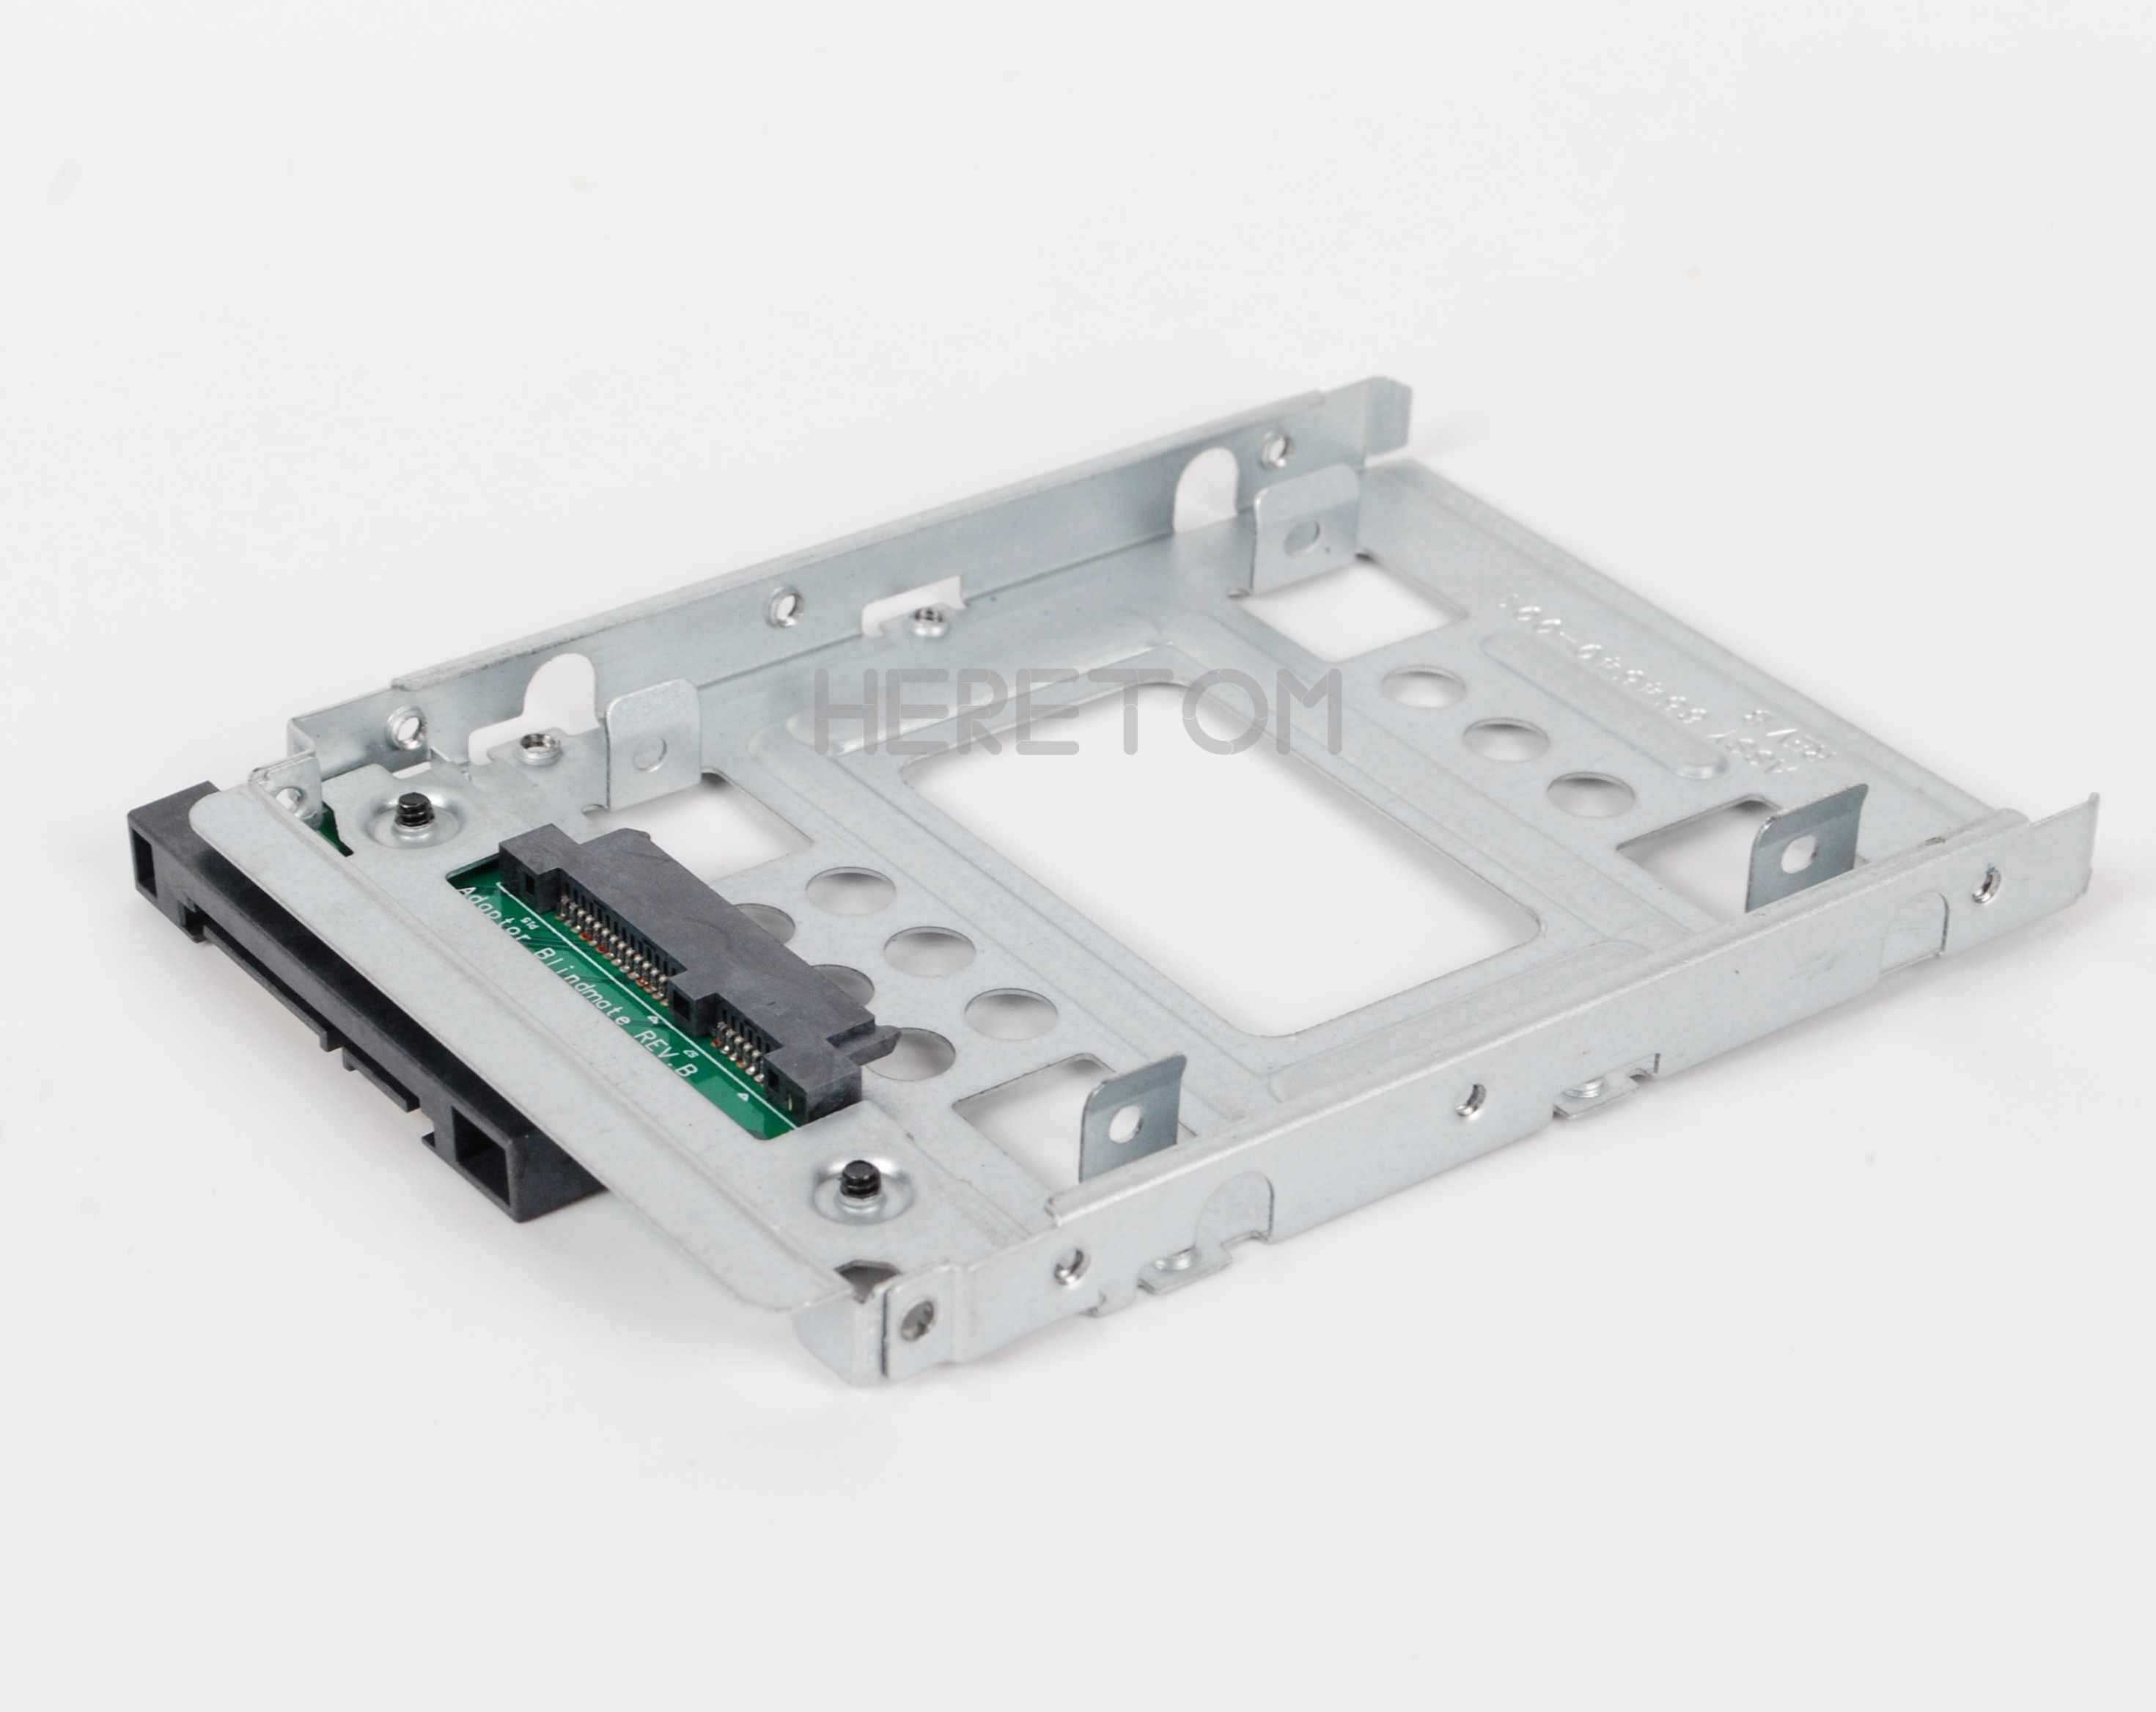 Heretom SAS/SATA/SSD 2.5